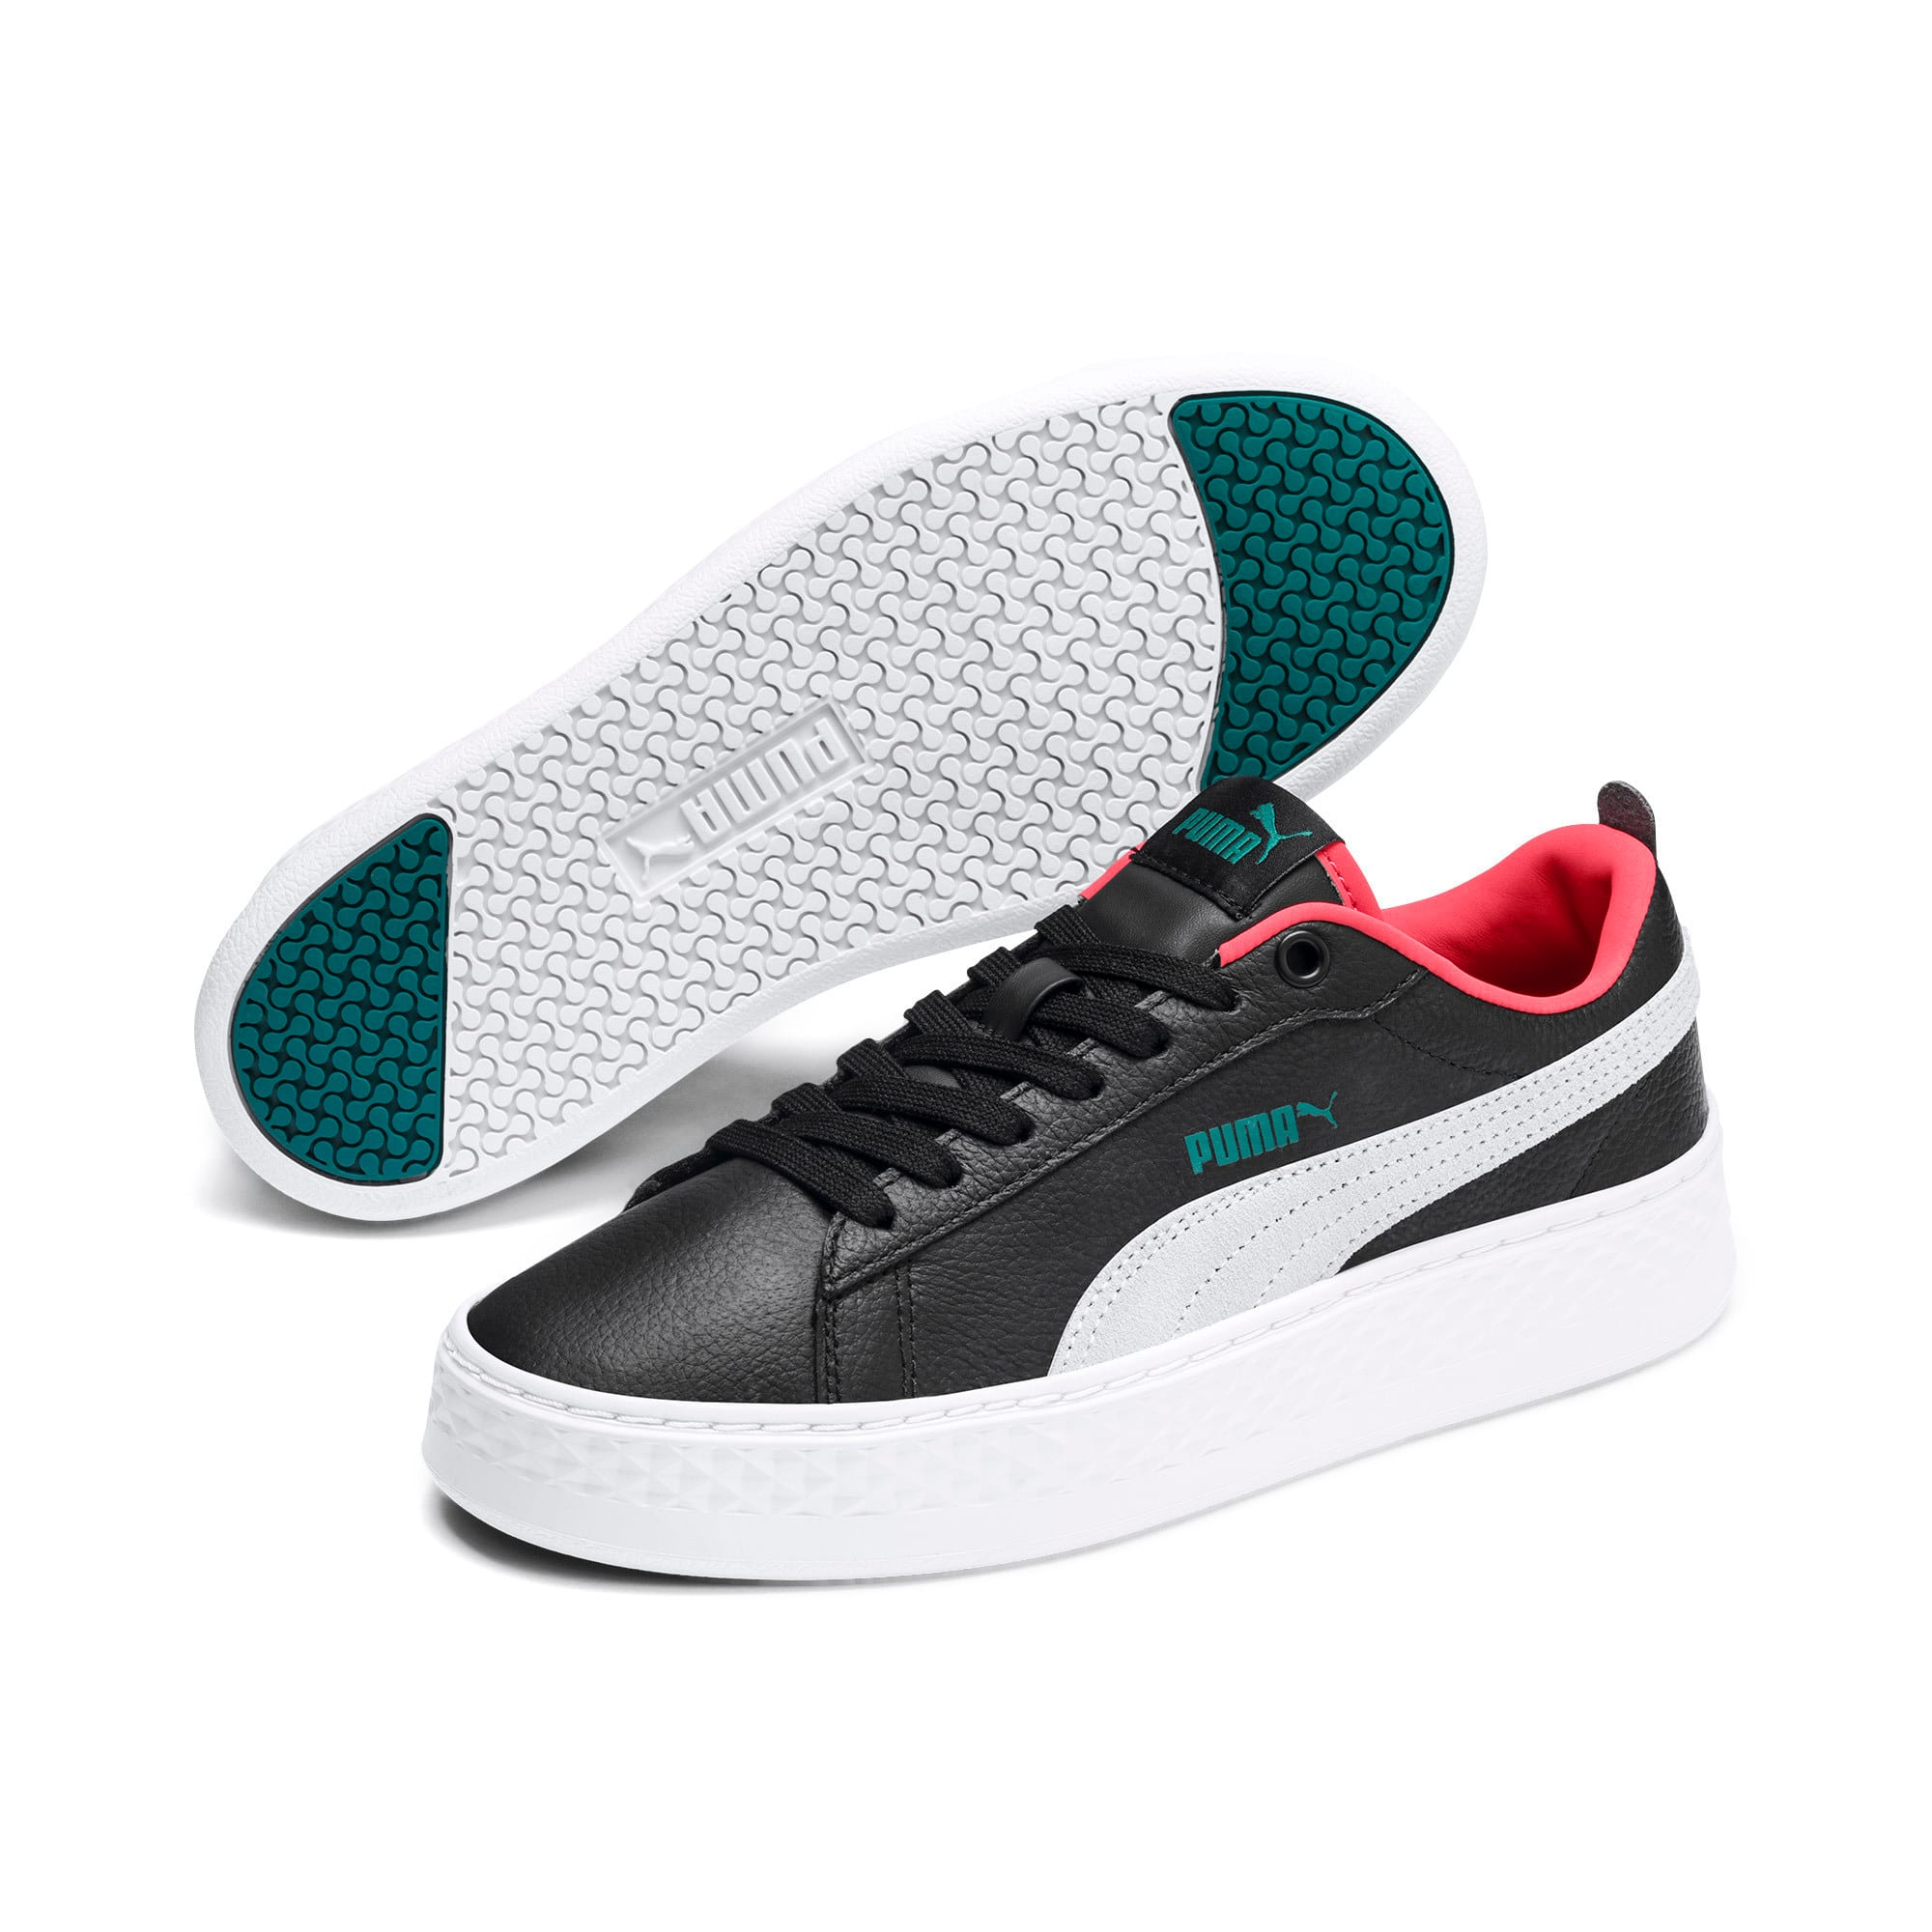 Thumbnail 4 of Puma Smash Platform Women's Shoes, Black-White-T Green-C Coral, medium-IND